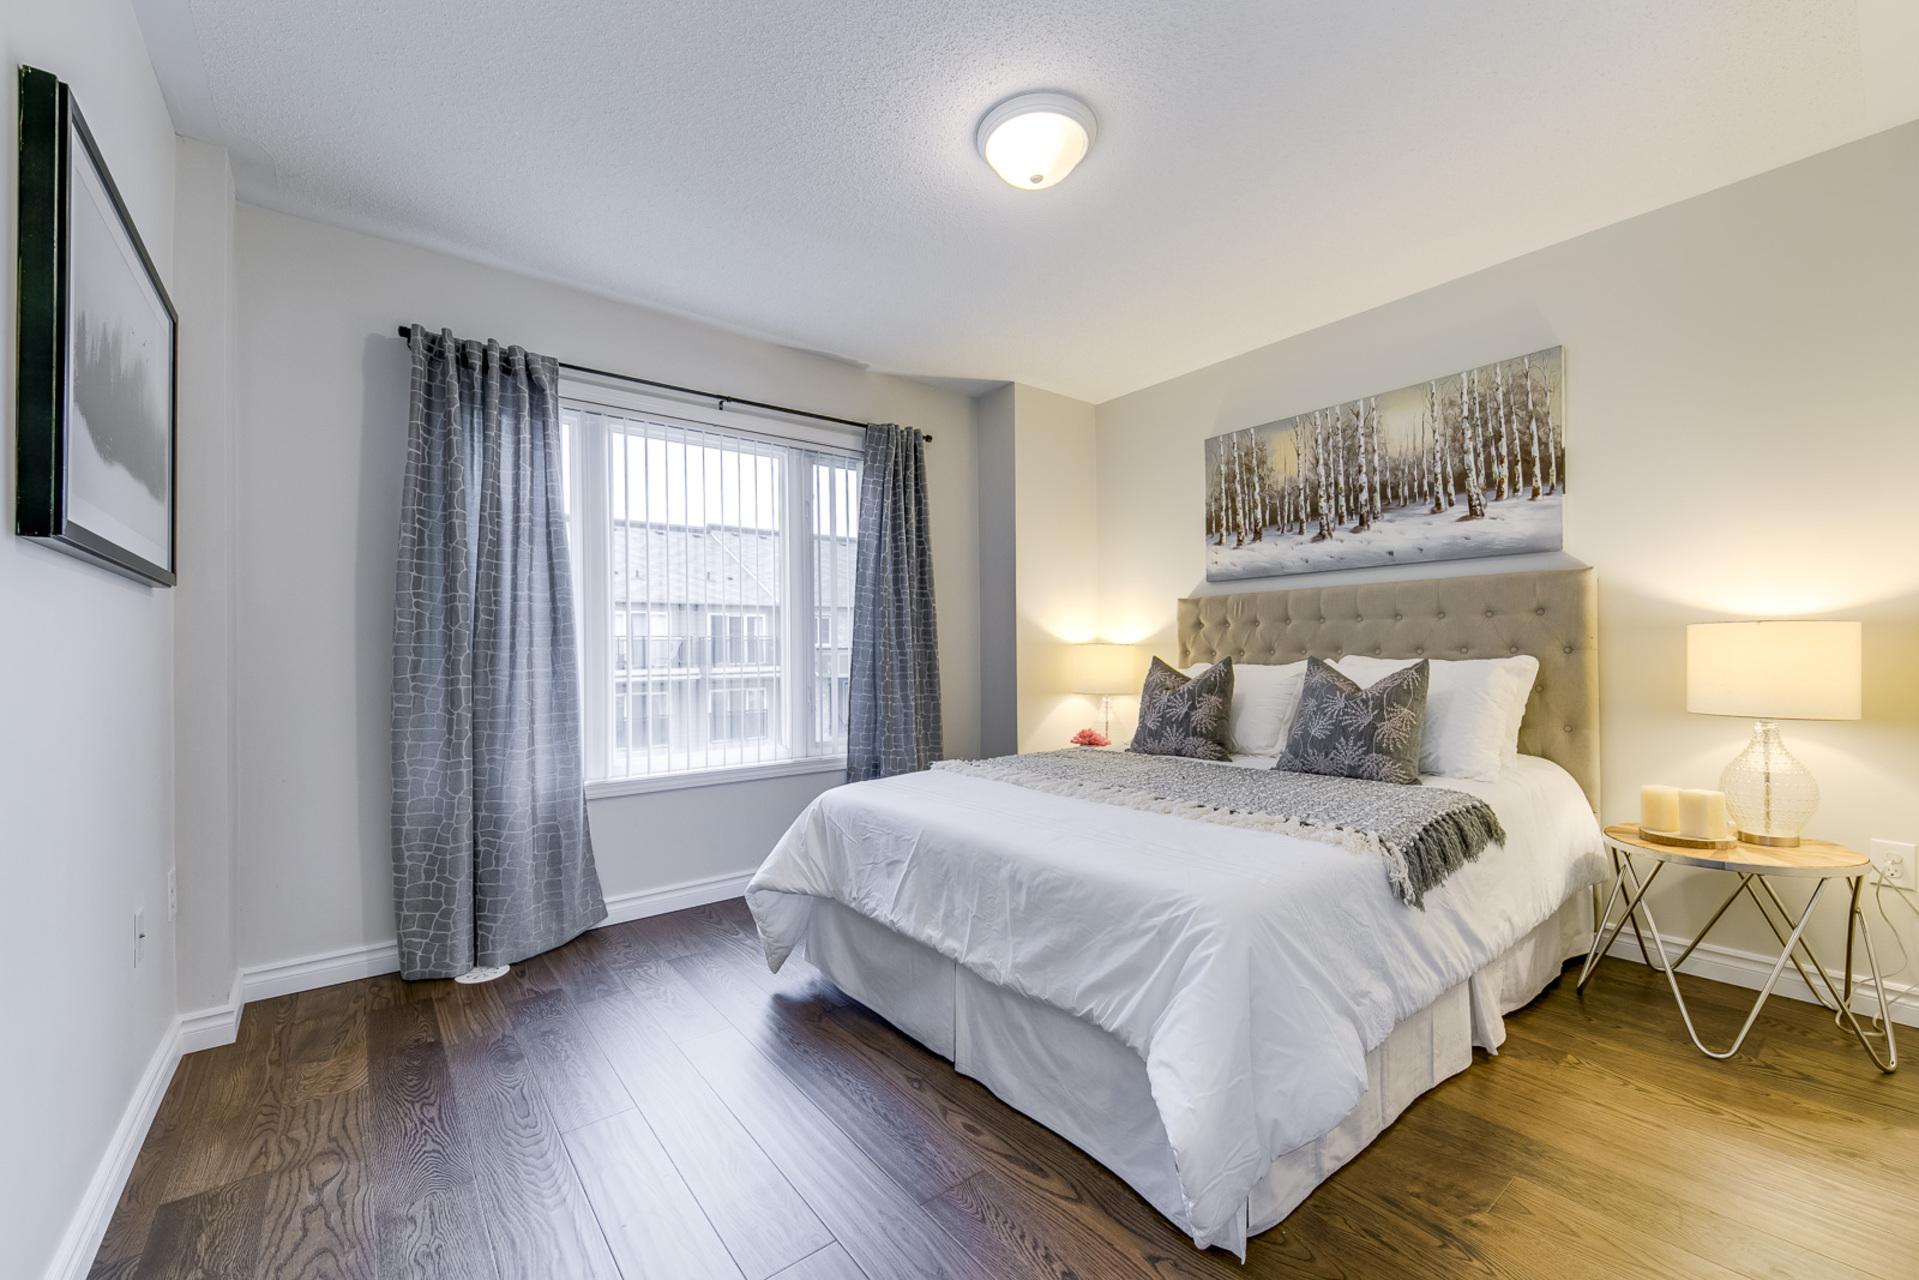 Master Bedroom - 2891 Rio Crt, Mississauga - Elite3 & Team at 46 - 2891 Rio Court, Central Erin Mills, Mississauga